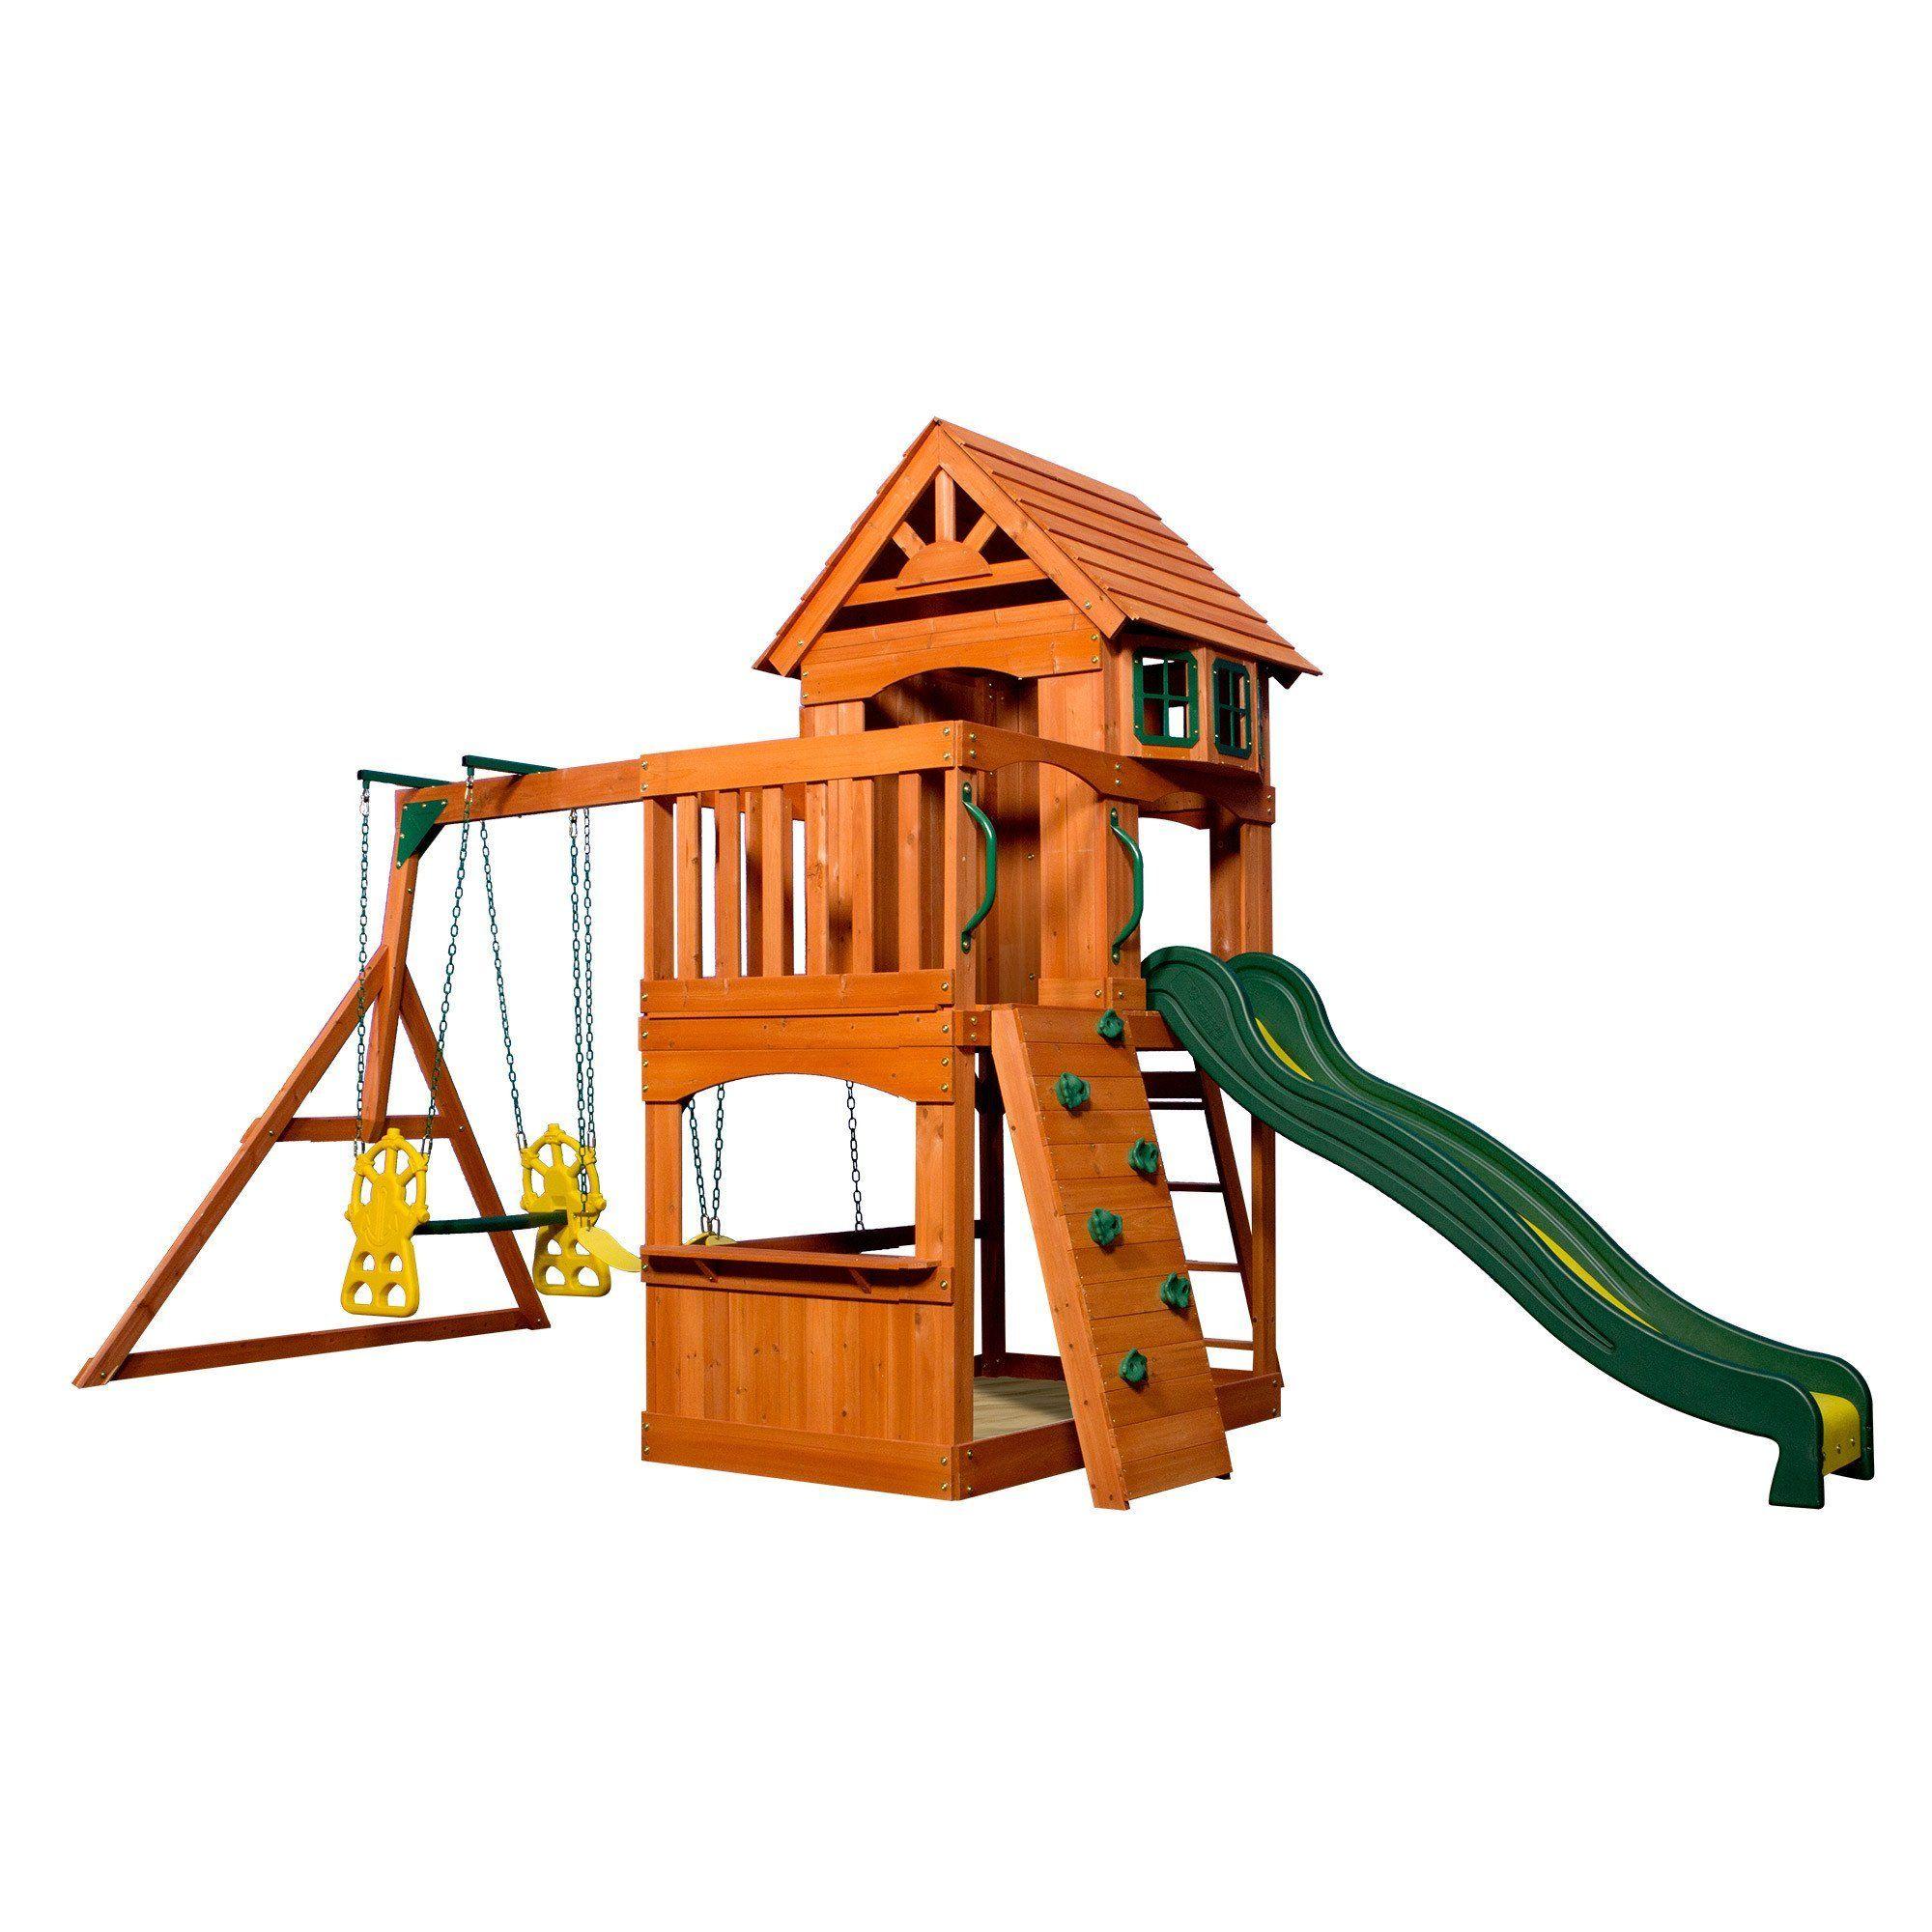 Adventure Play Sets Atlantis Wooden Swing Set 599 00 Wooden